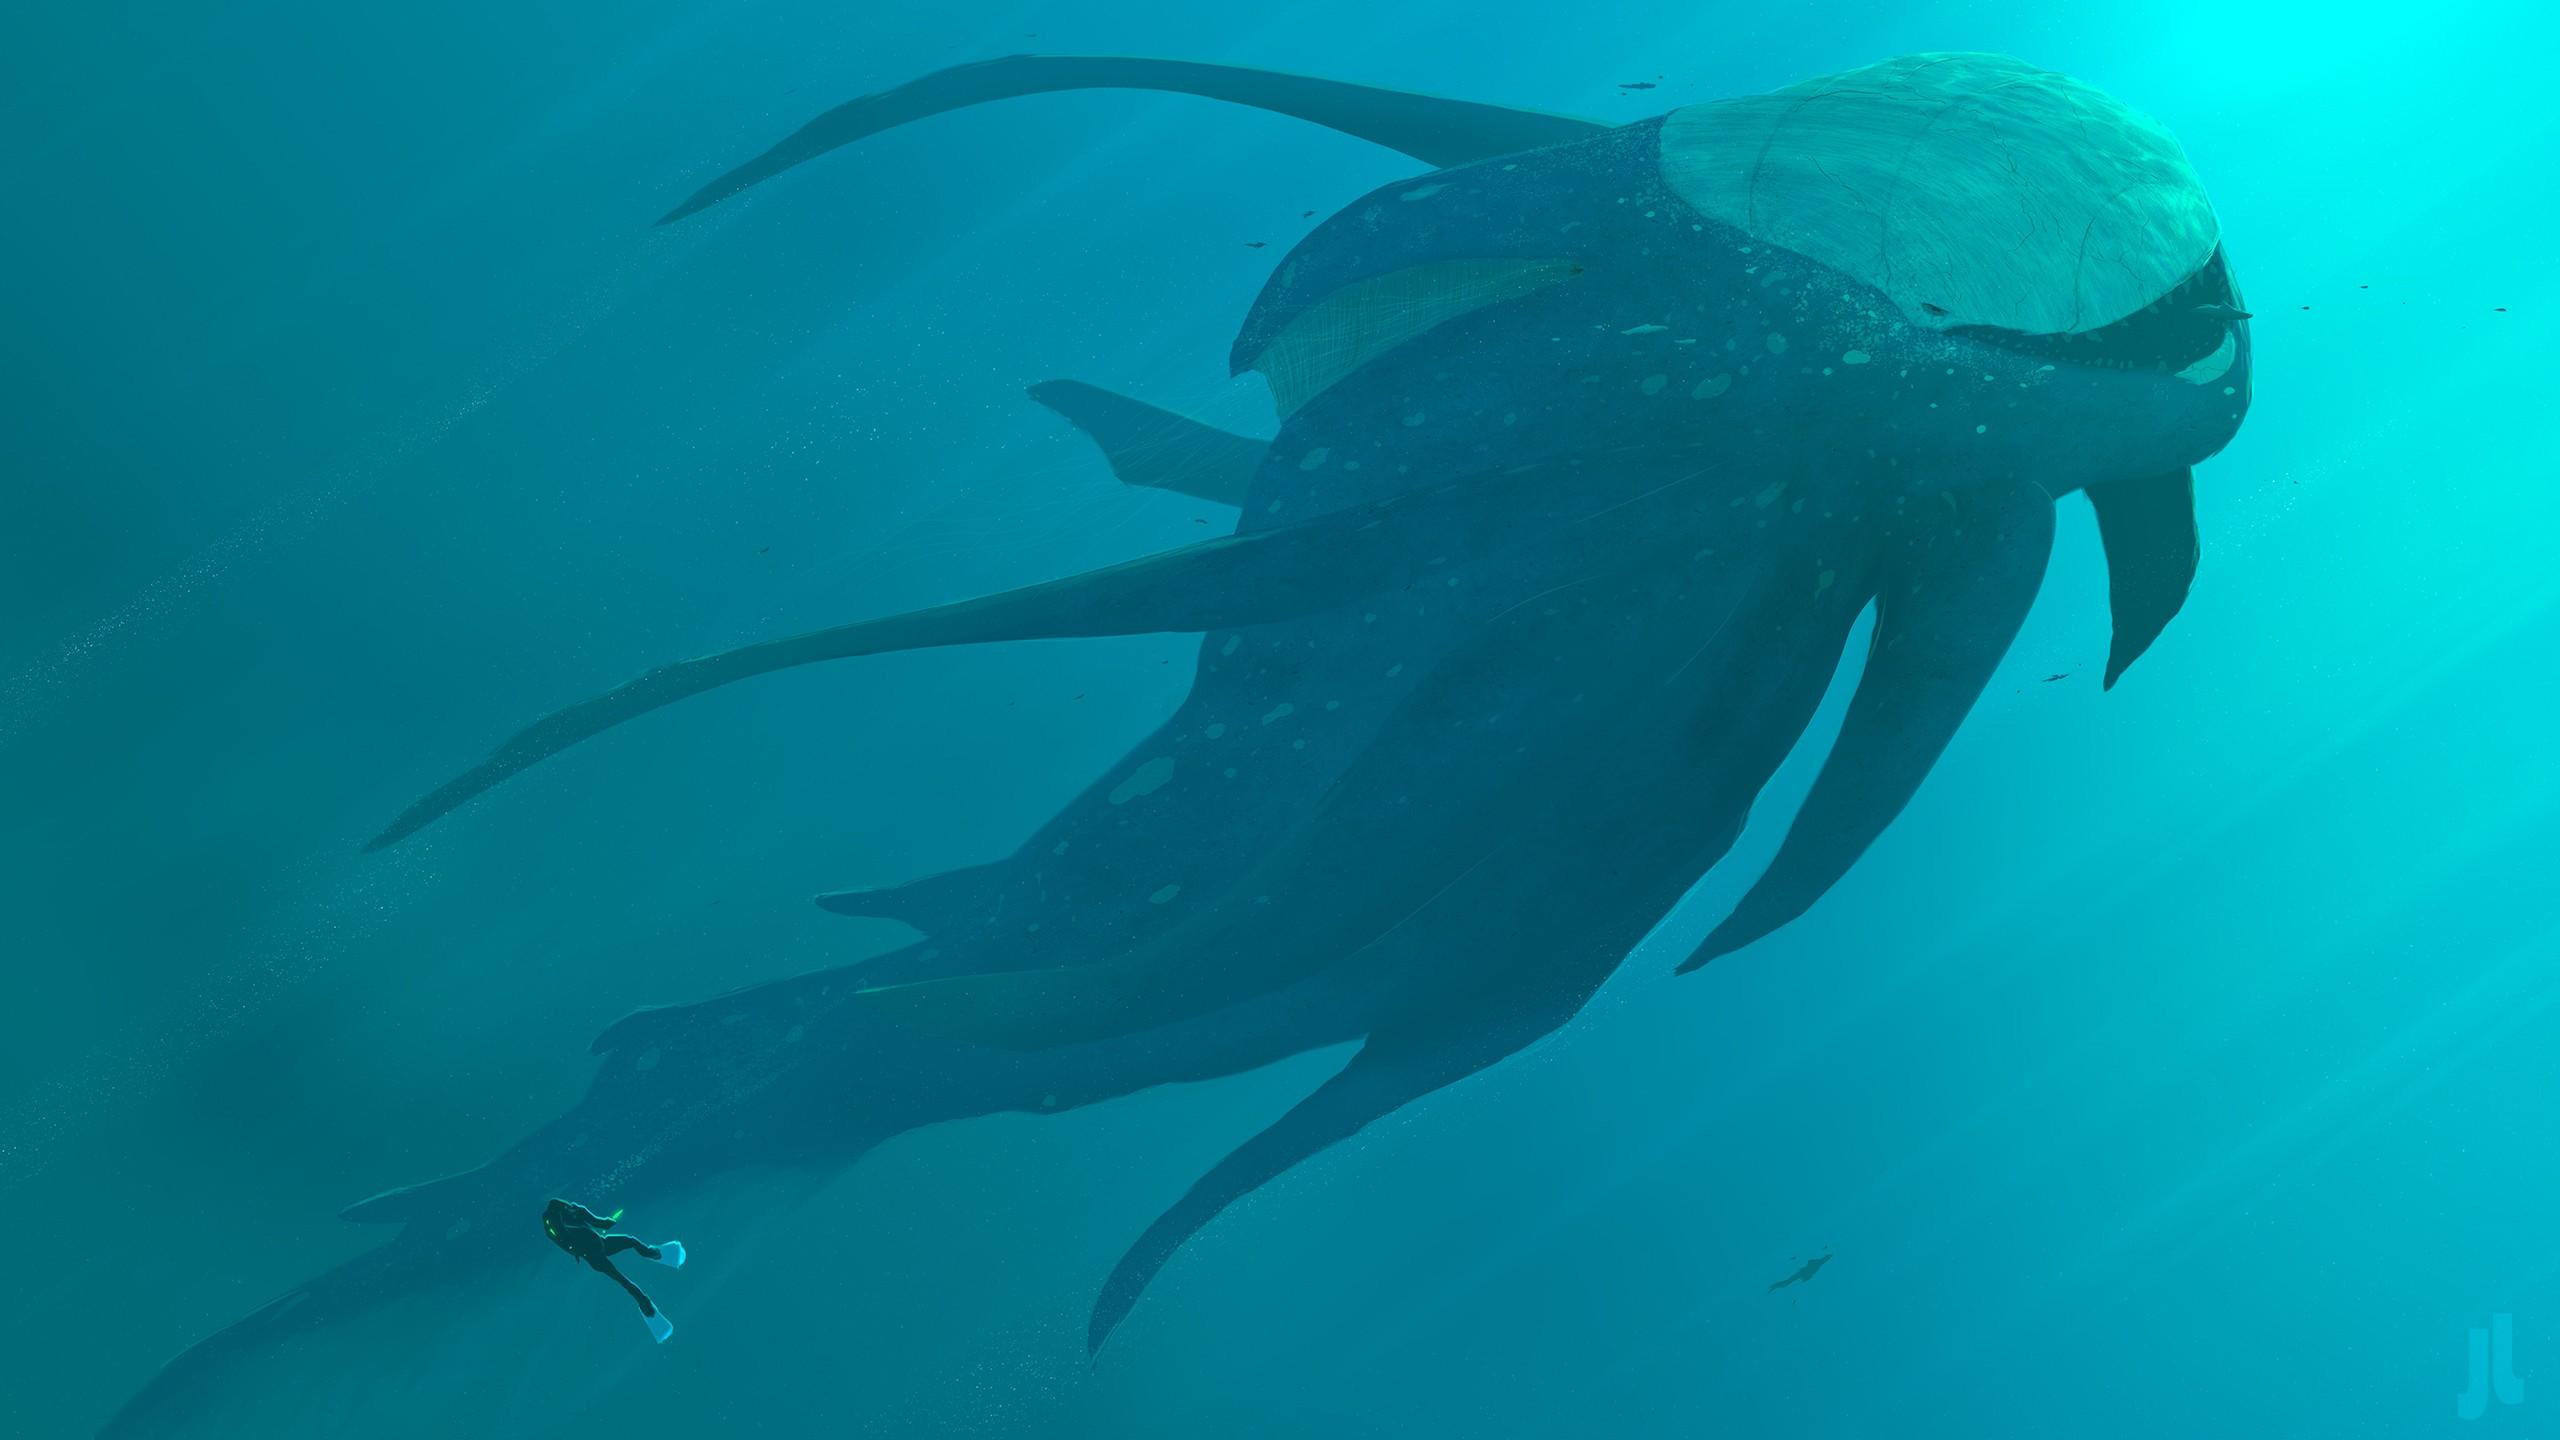 General 2560x1440 underwater turquoise cyan artwork